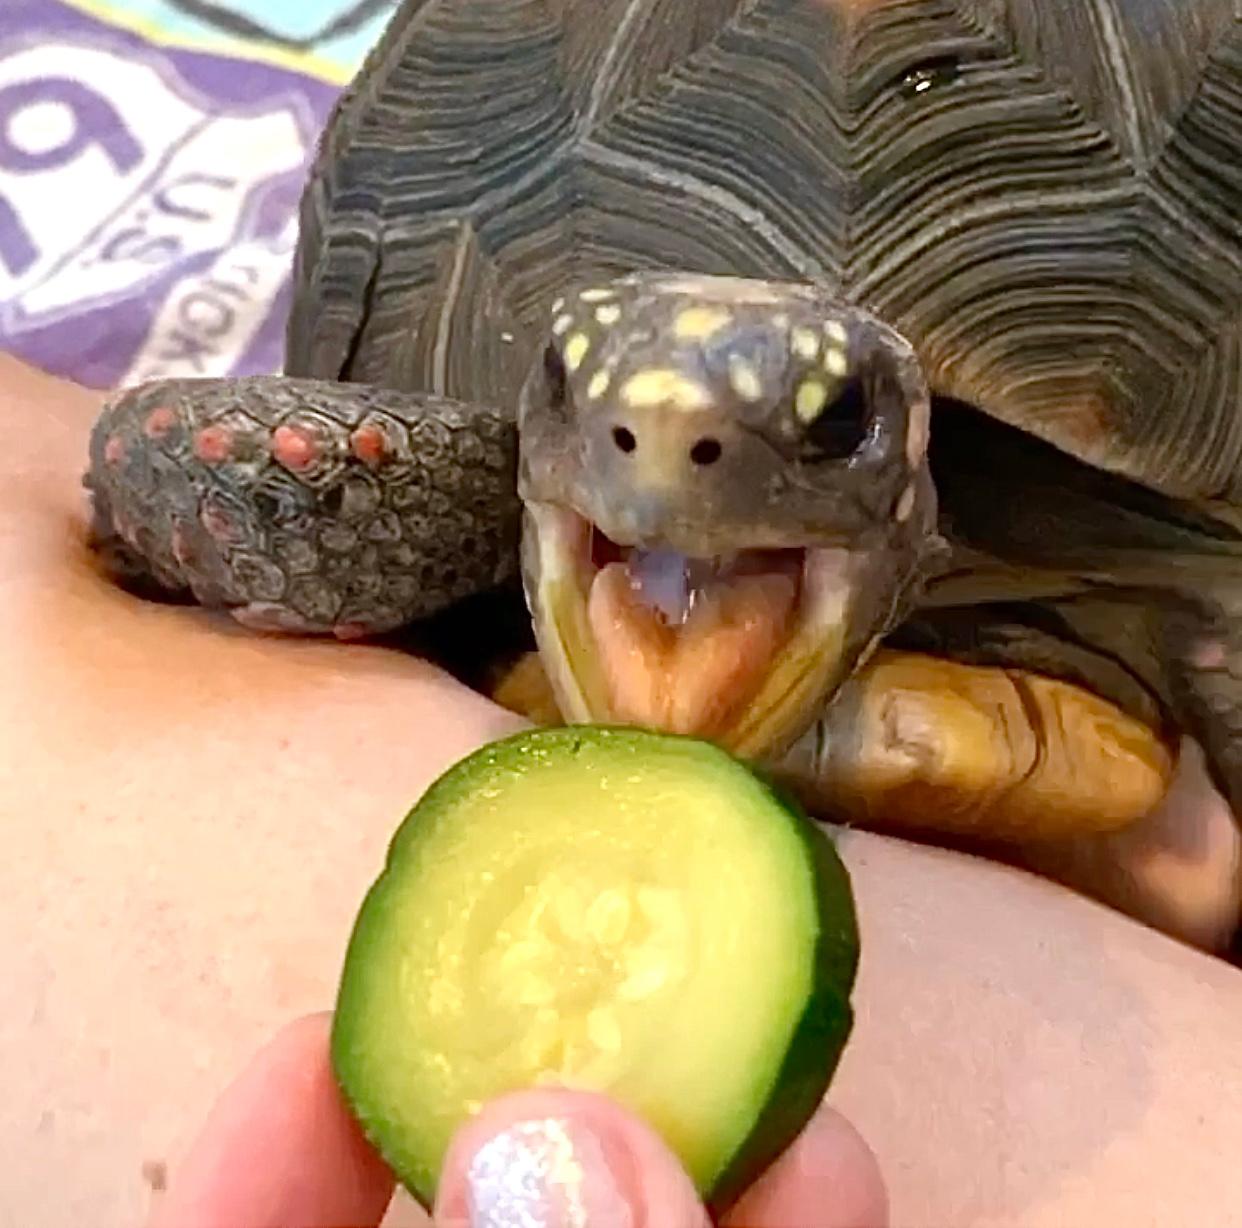 tortoise eats zucchini